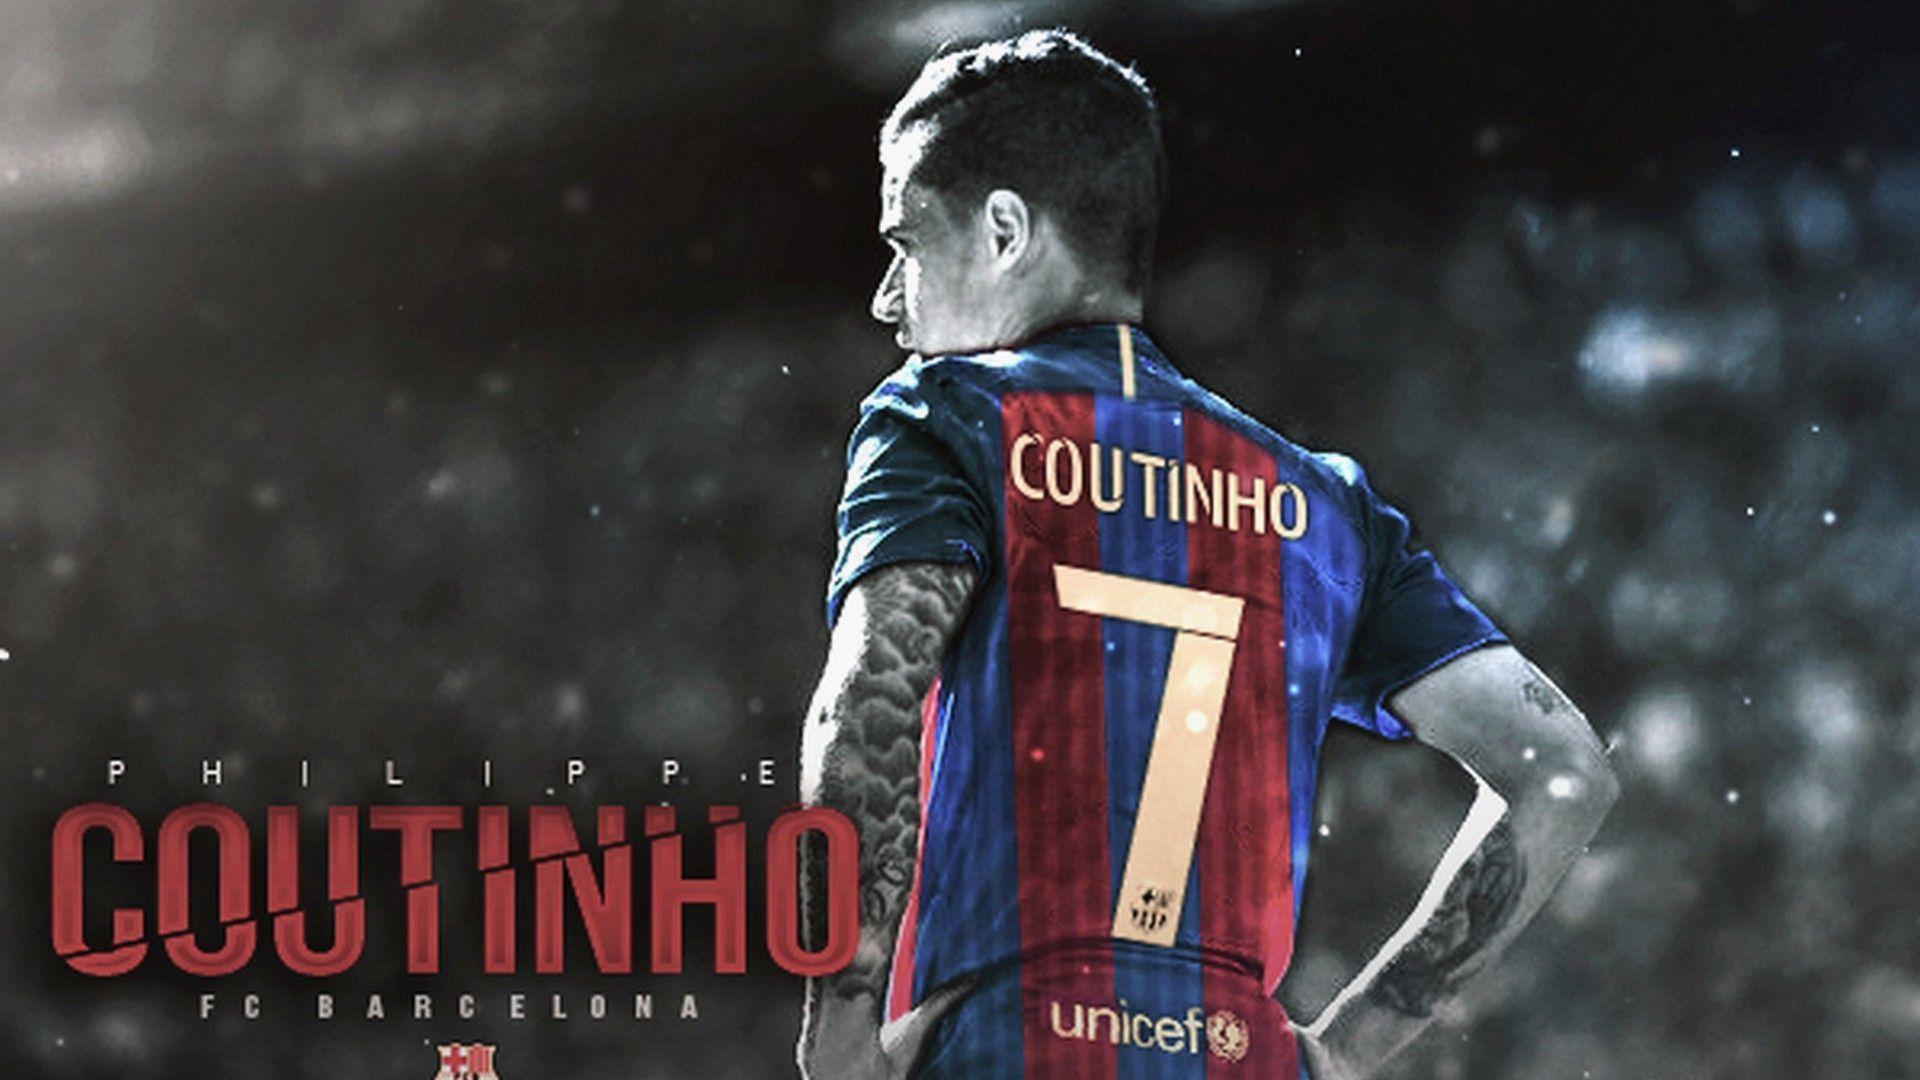 Wallpaper Hd 1080p Psg New Coutinho Barcelona Wallpaper Hd 2018 .